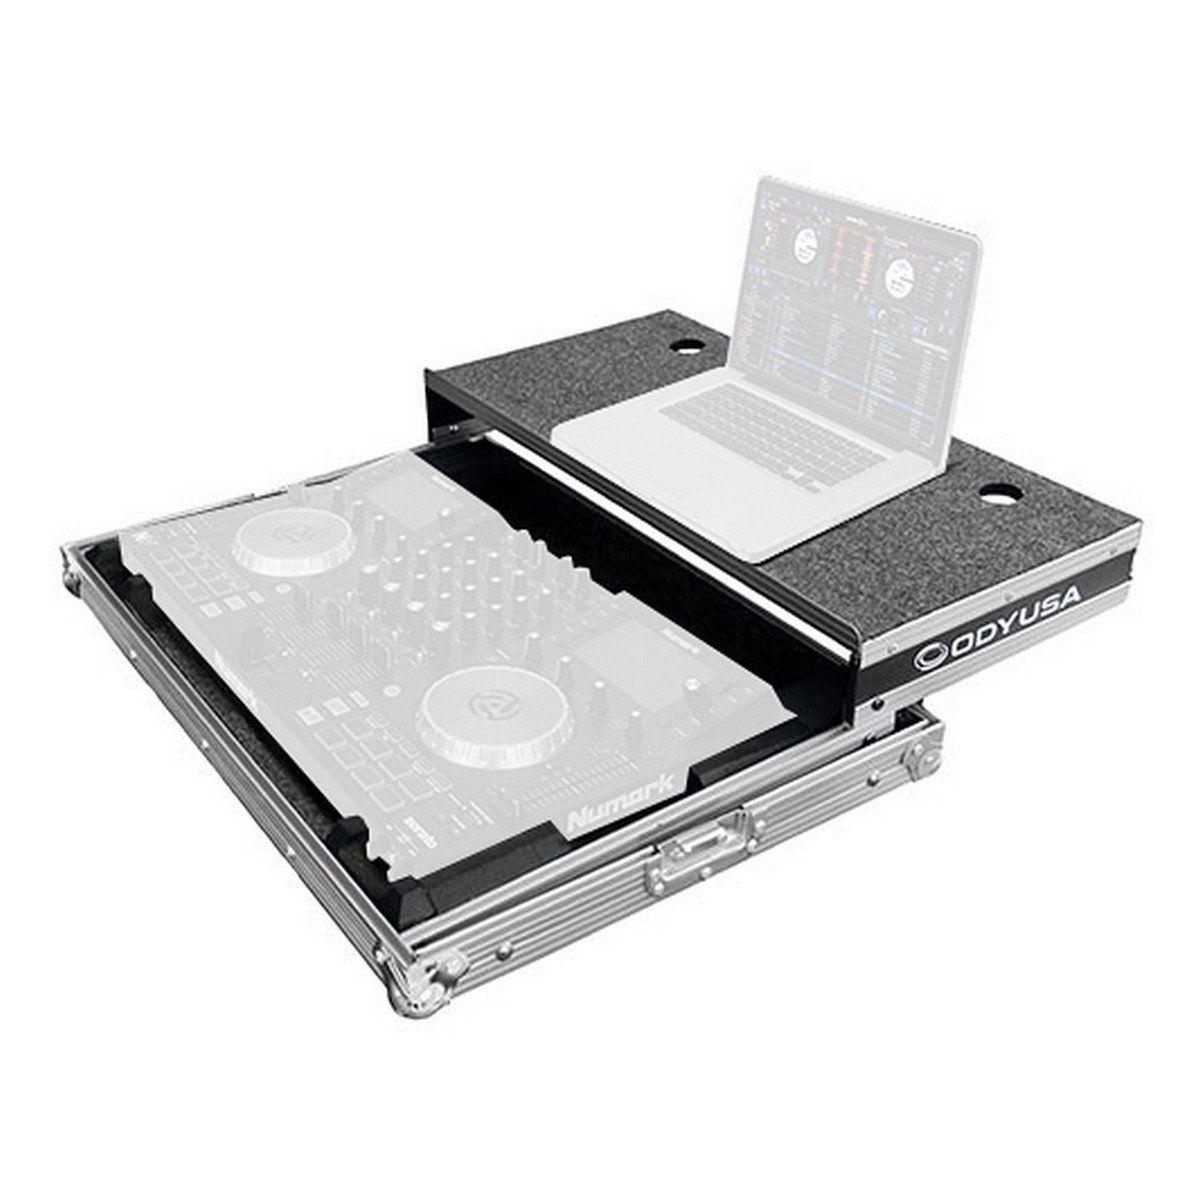 Odyssey Cases FZGSNV | Flight Zone Numark NV Serato DJ Controller Glide Style Case : $299